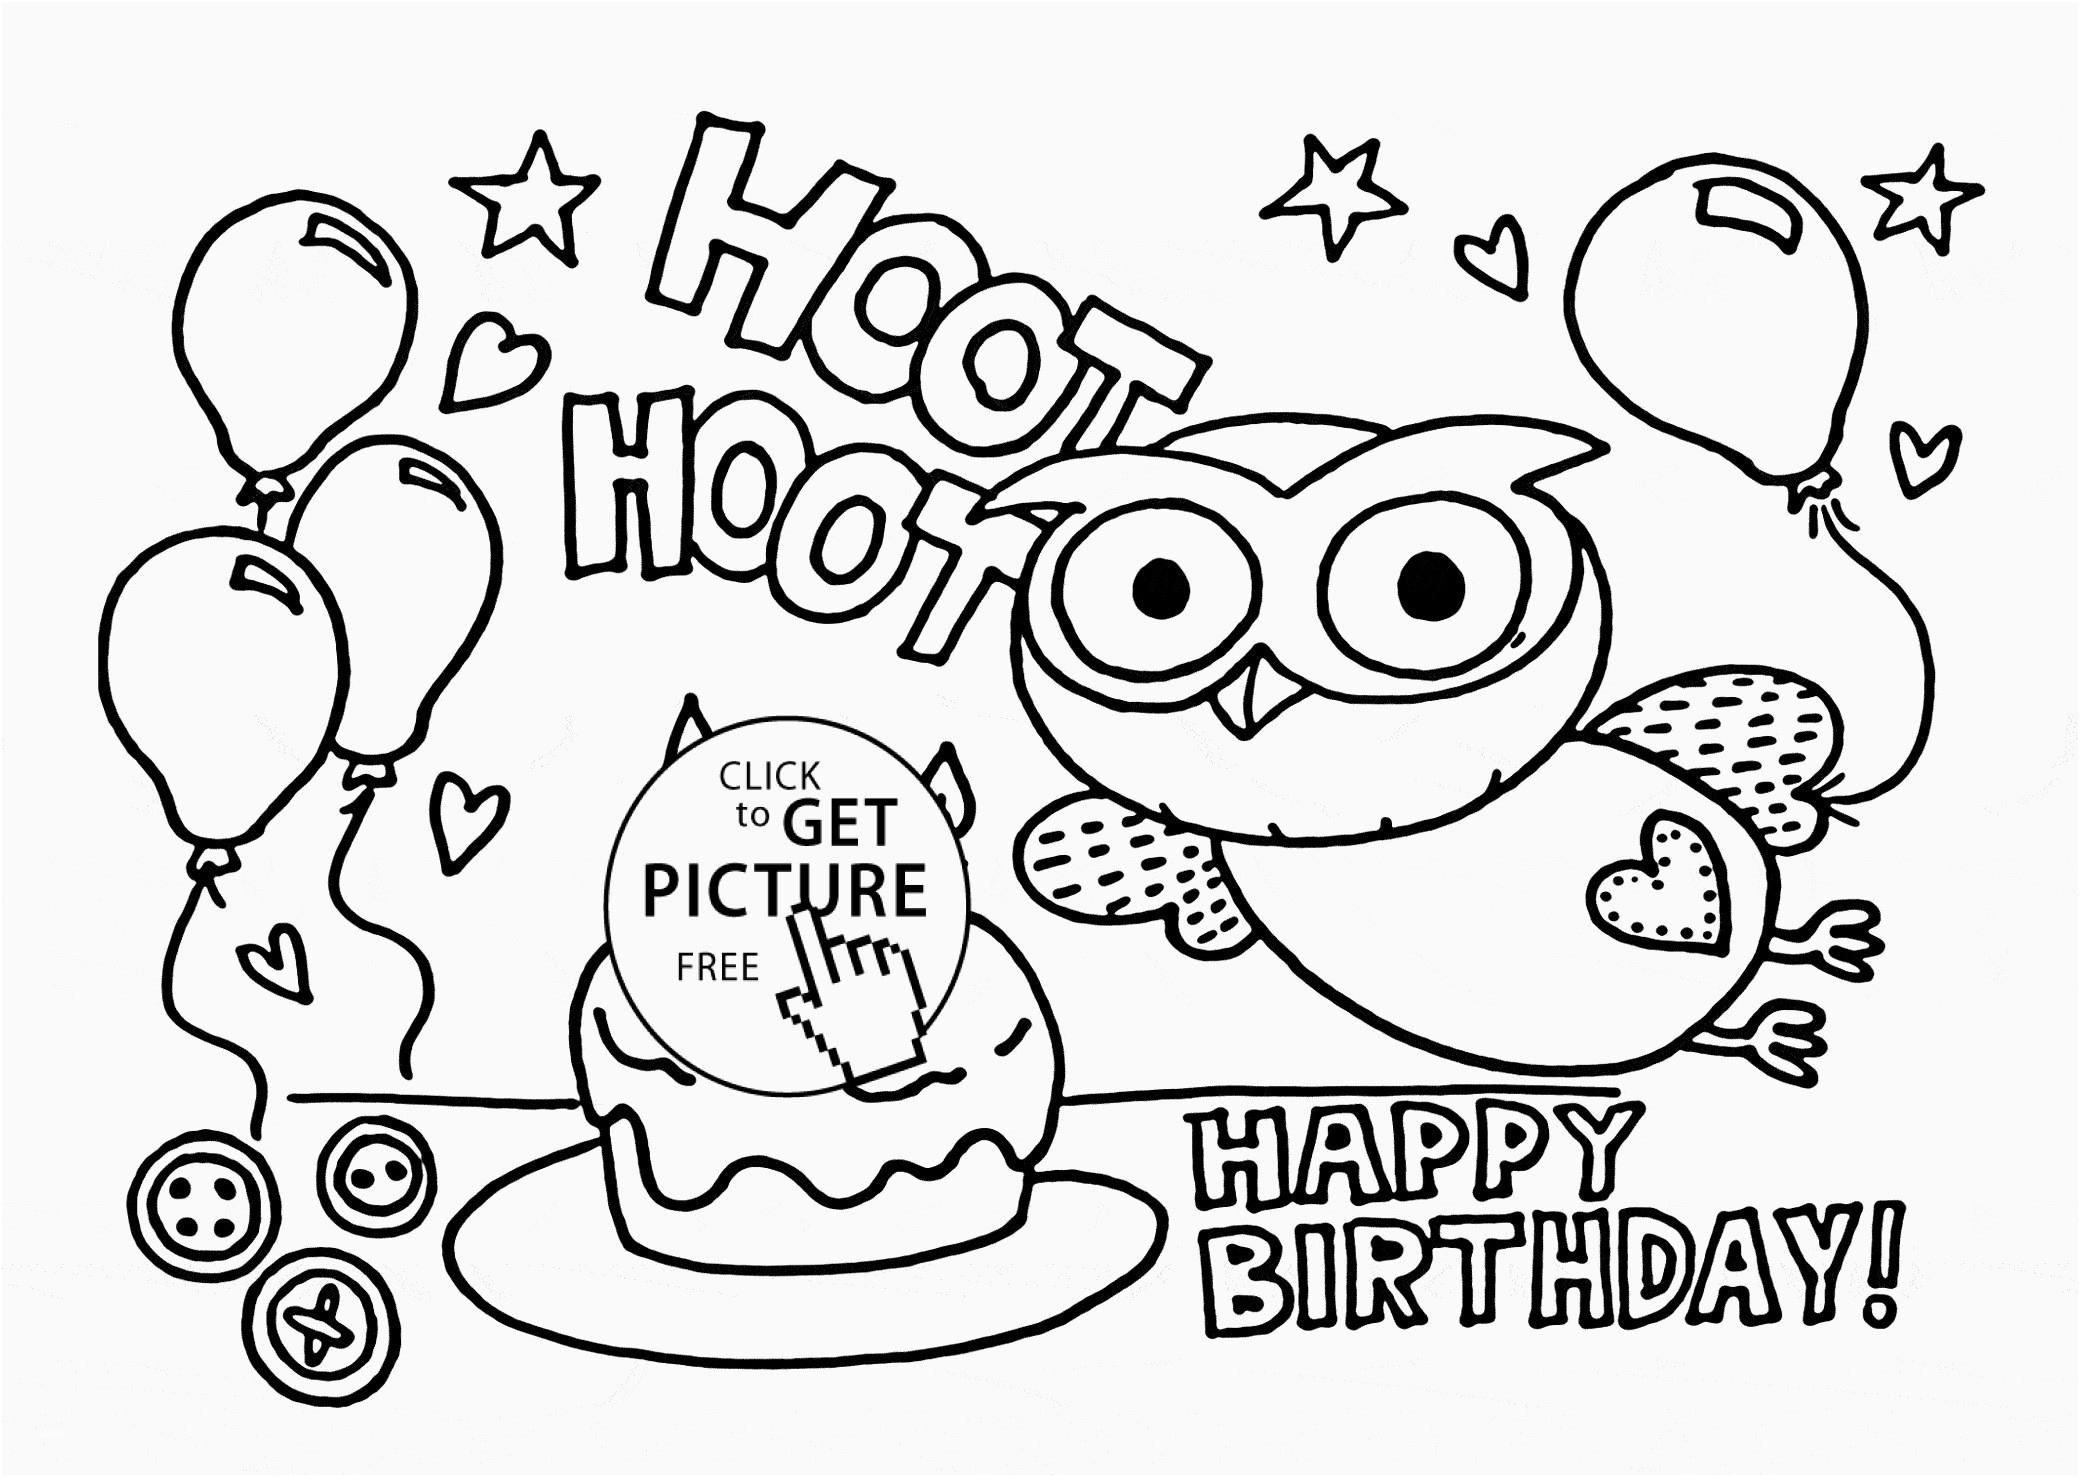 15 Inspirational Free Printable Humorous Birthday Cards | Goldworld - Free Printable Humorous Birthday Cards